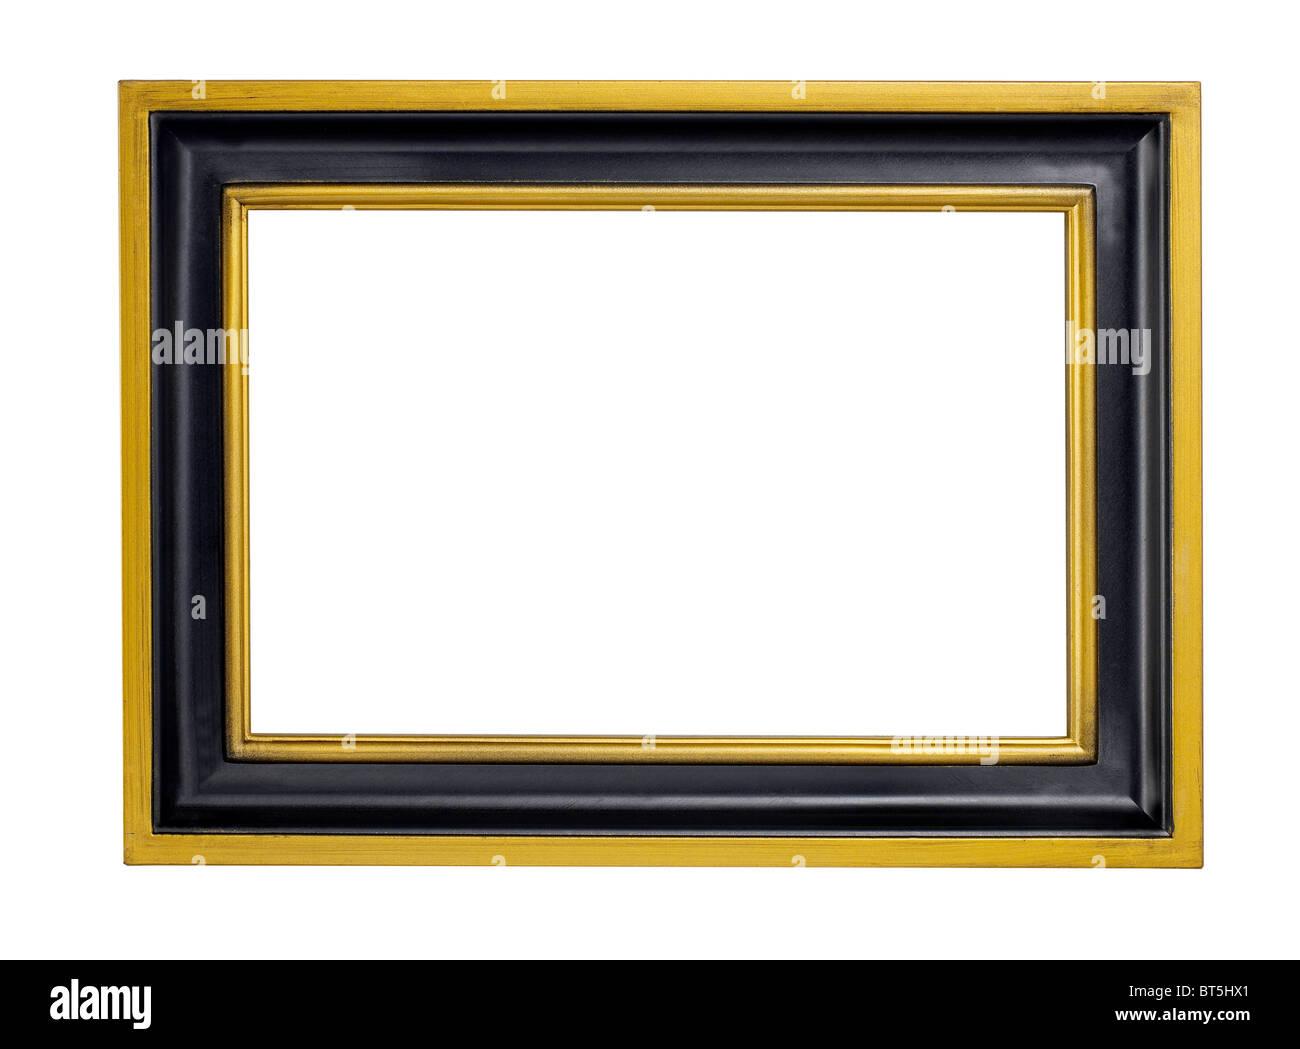 borders stockfotos borders bilder alamy. Black Bedroom Furniture Sets. Home Design Ideas